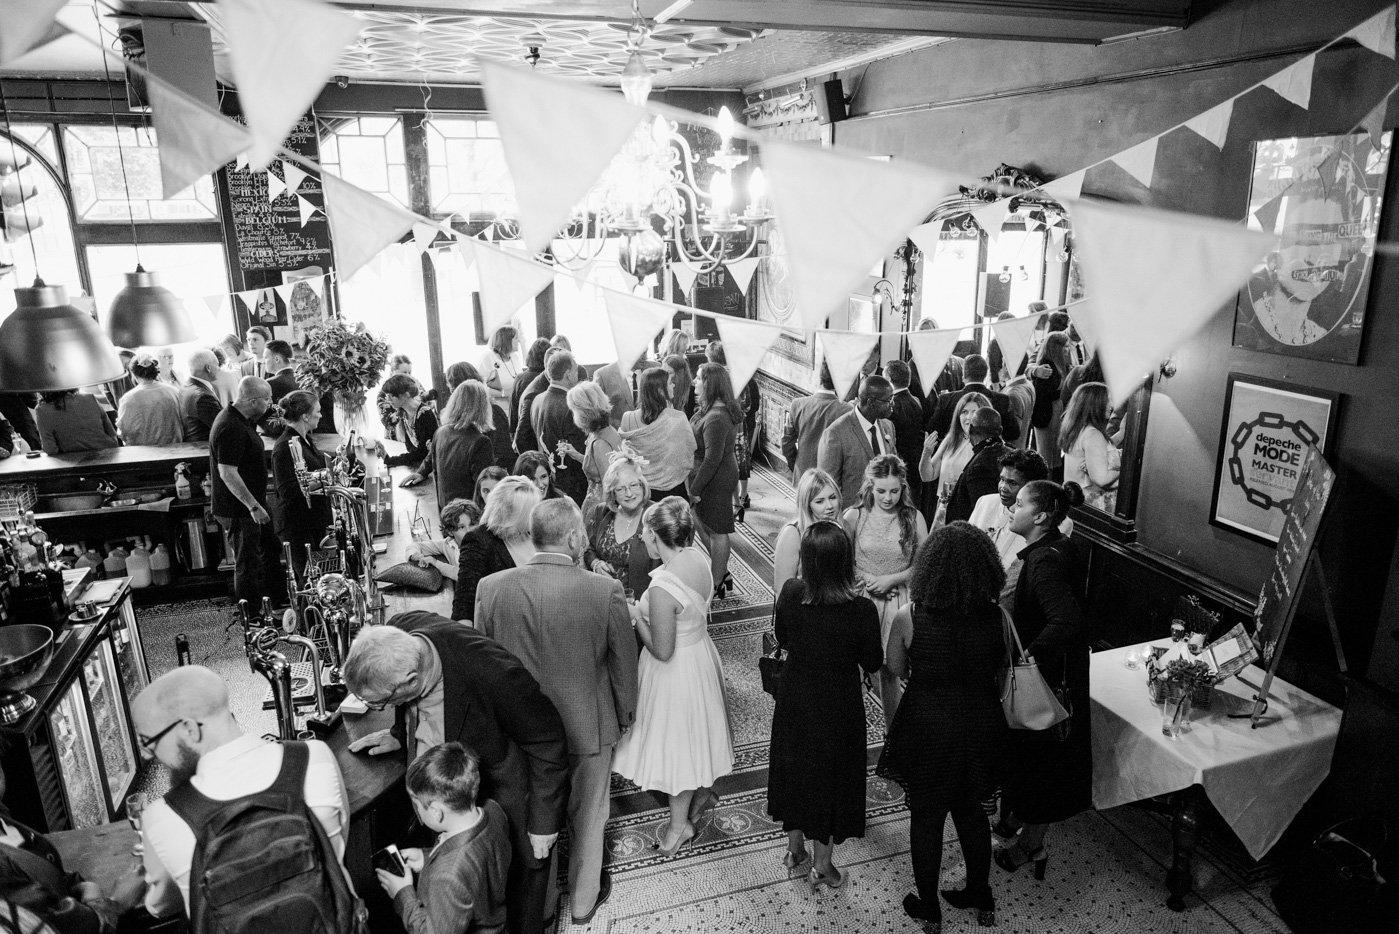 The Peasant London pub wedding